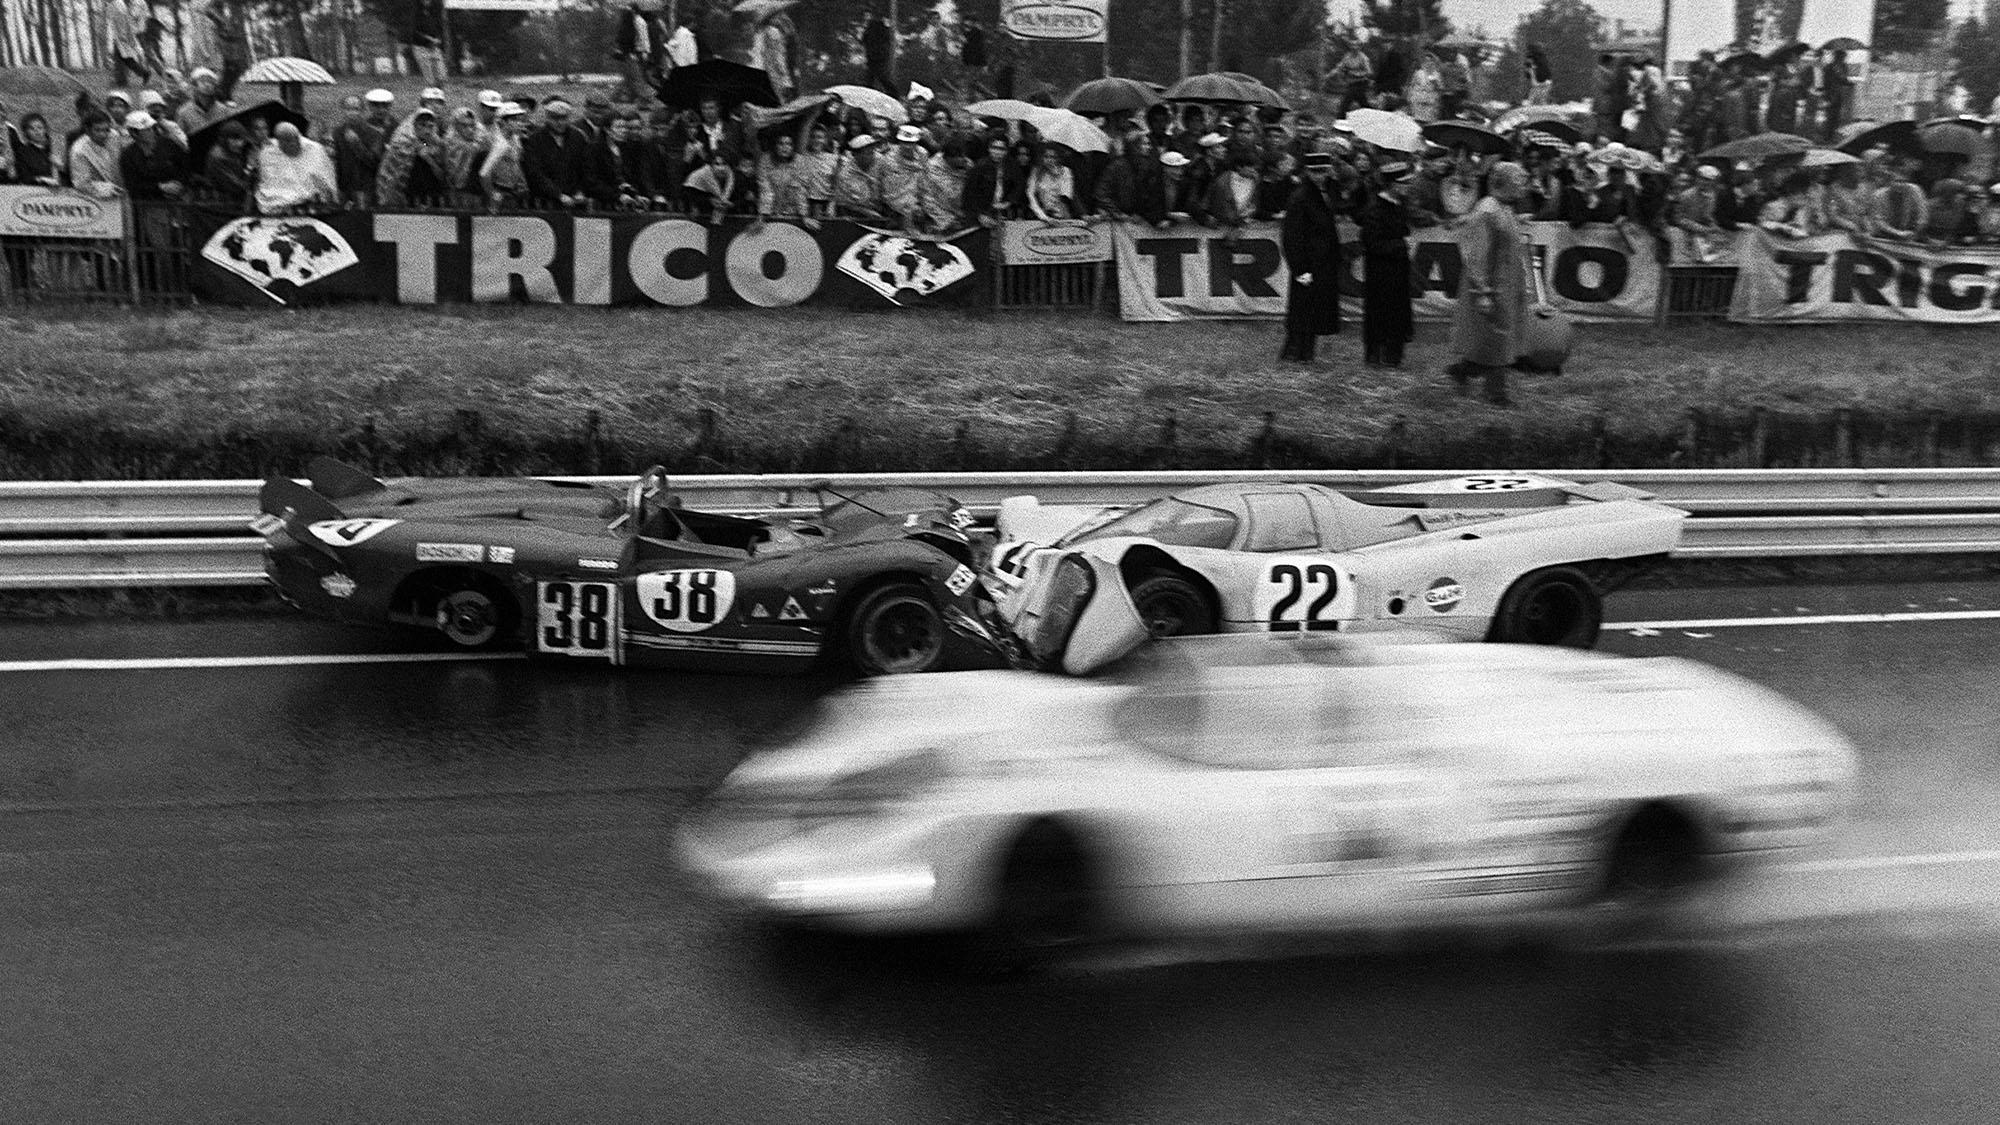 Mike Hailwood Porsche 917K craached at Le Mans 1970